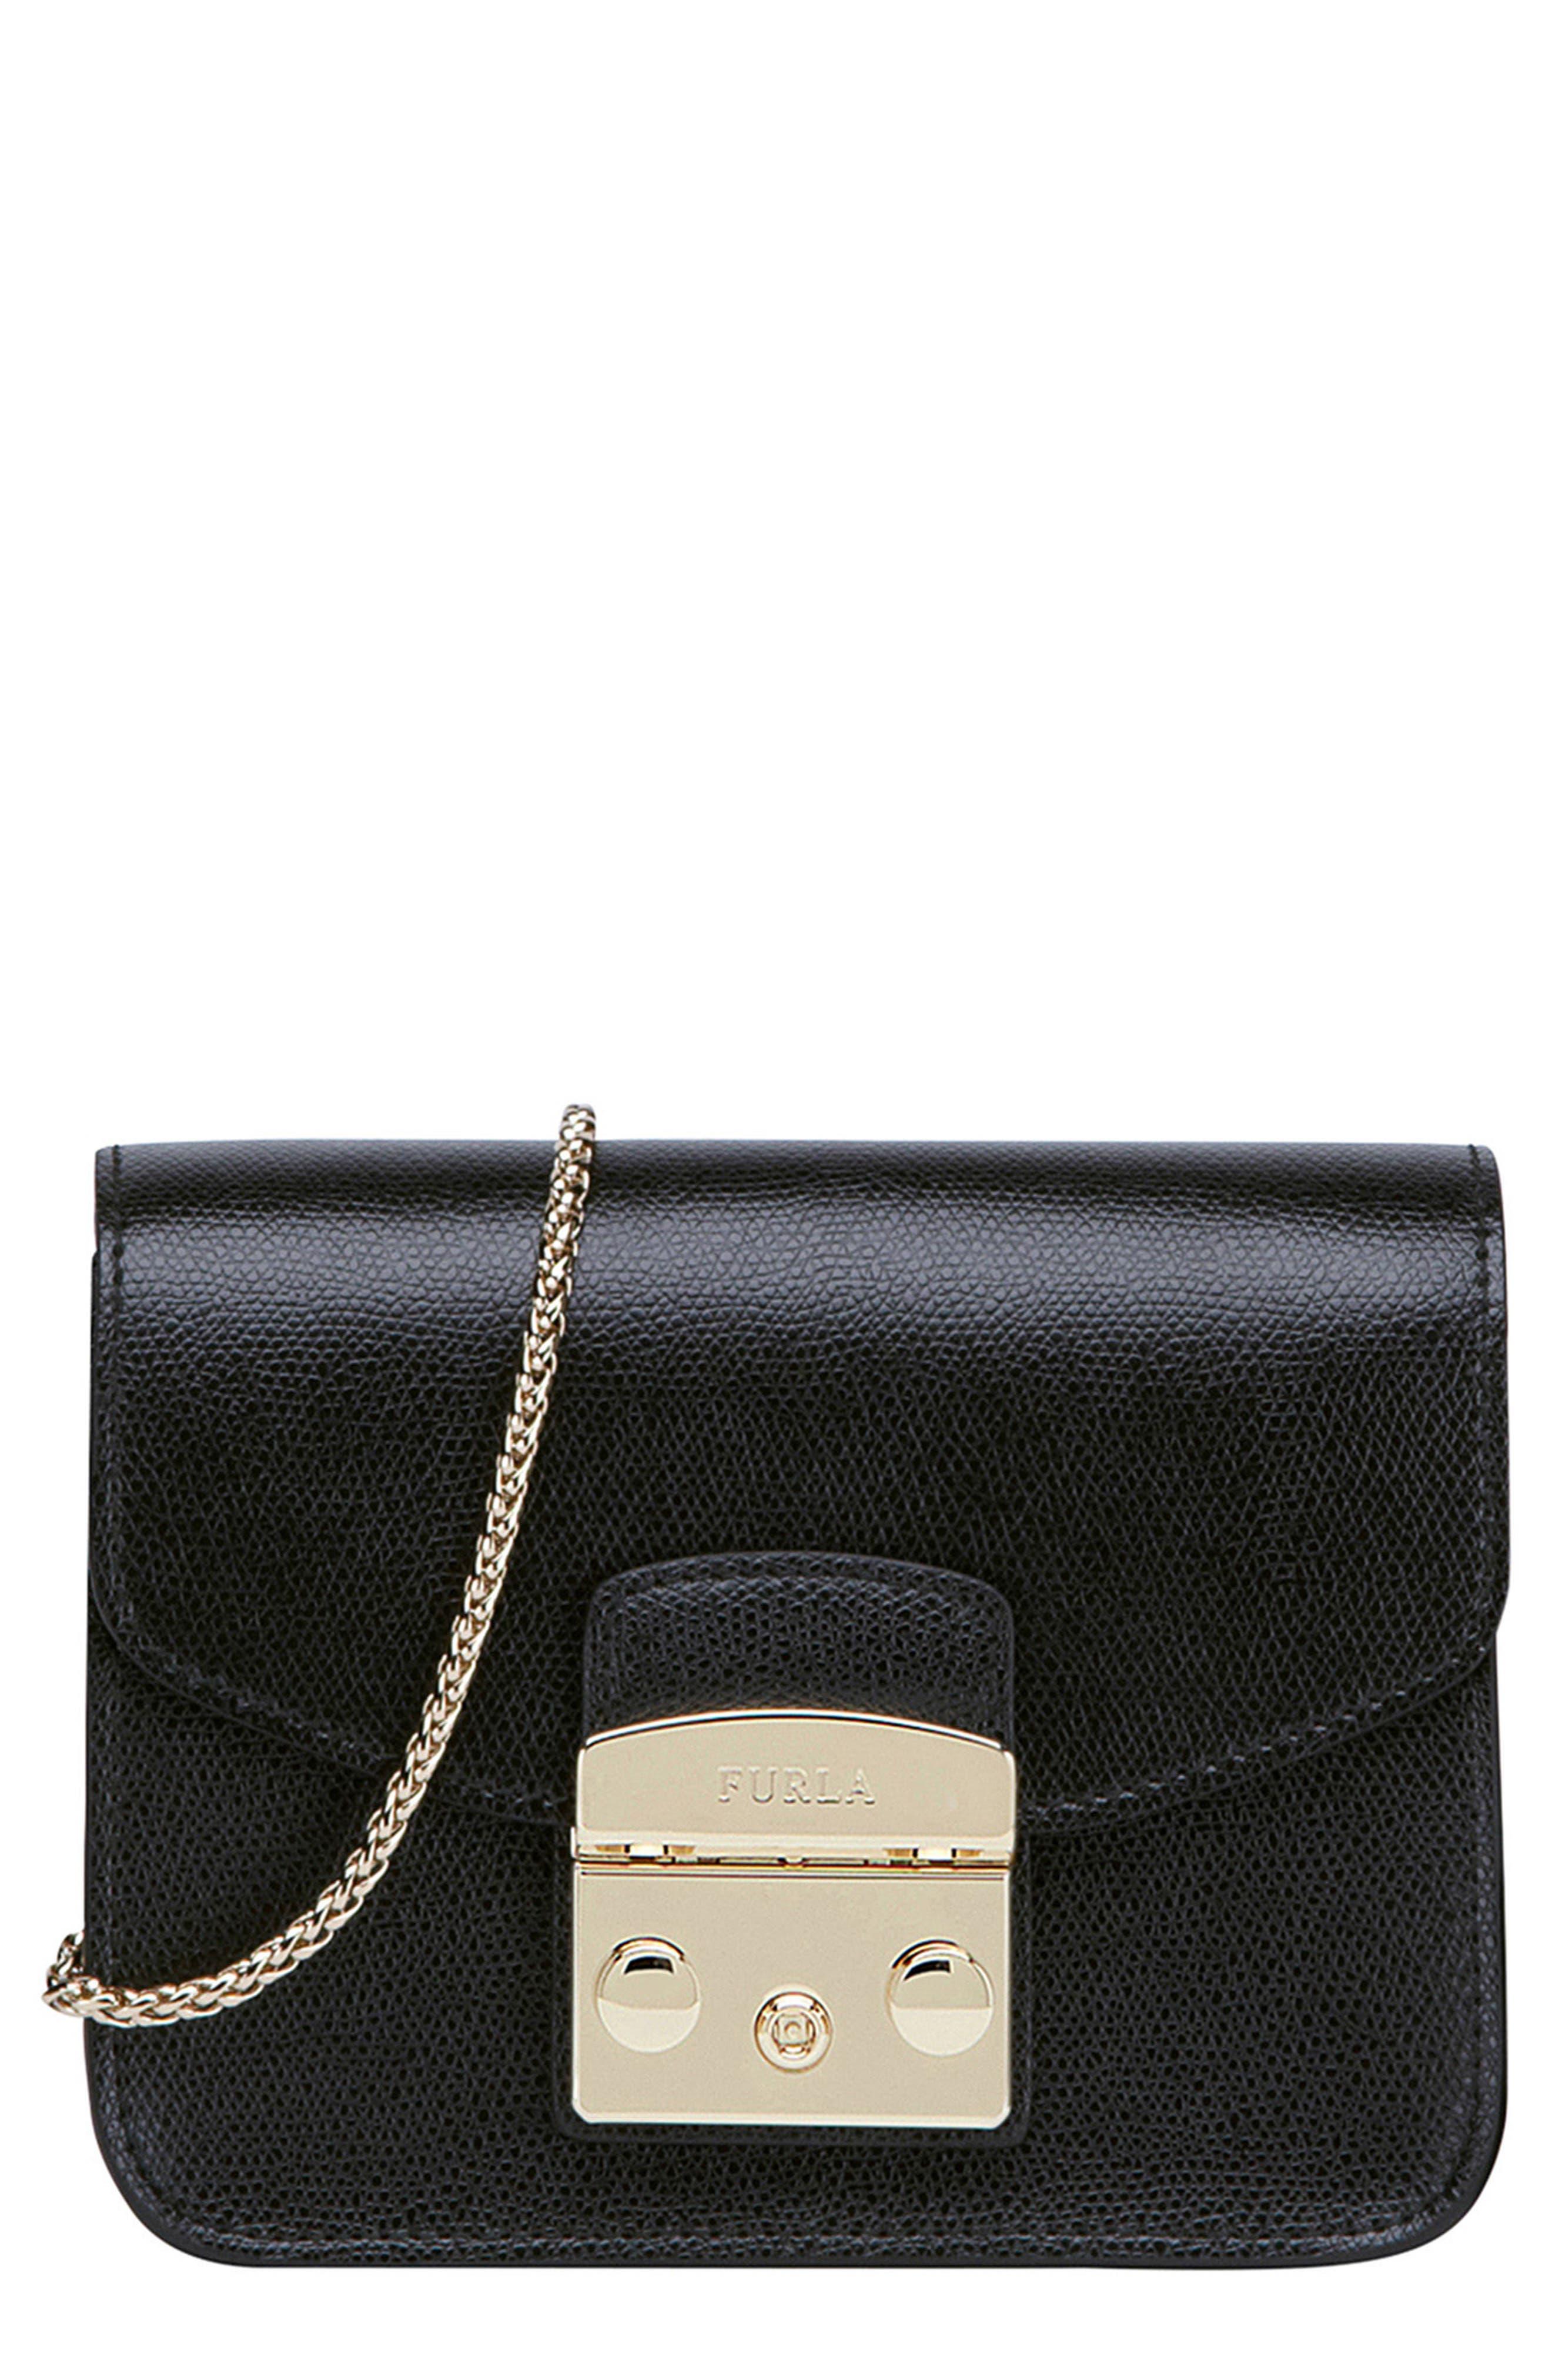 Mini Metropolis Leather Crossbody Bag,                             Main thumbnail 1, color,                             004